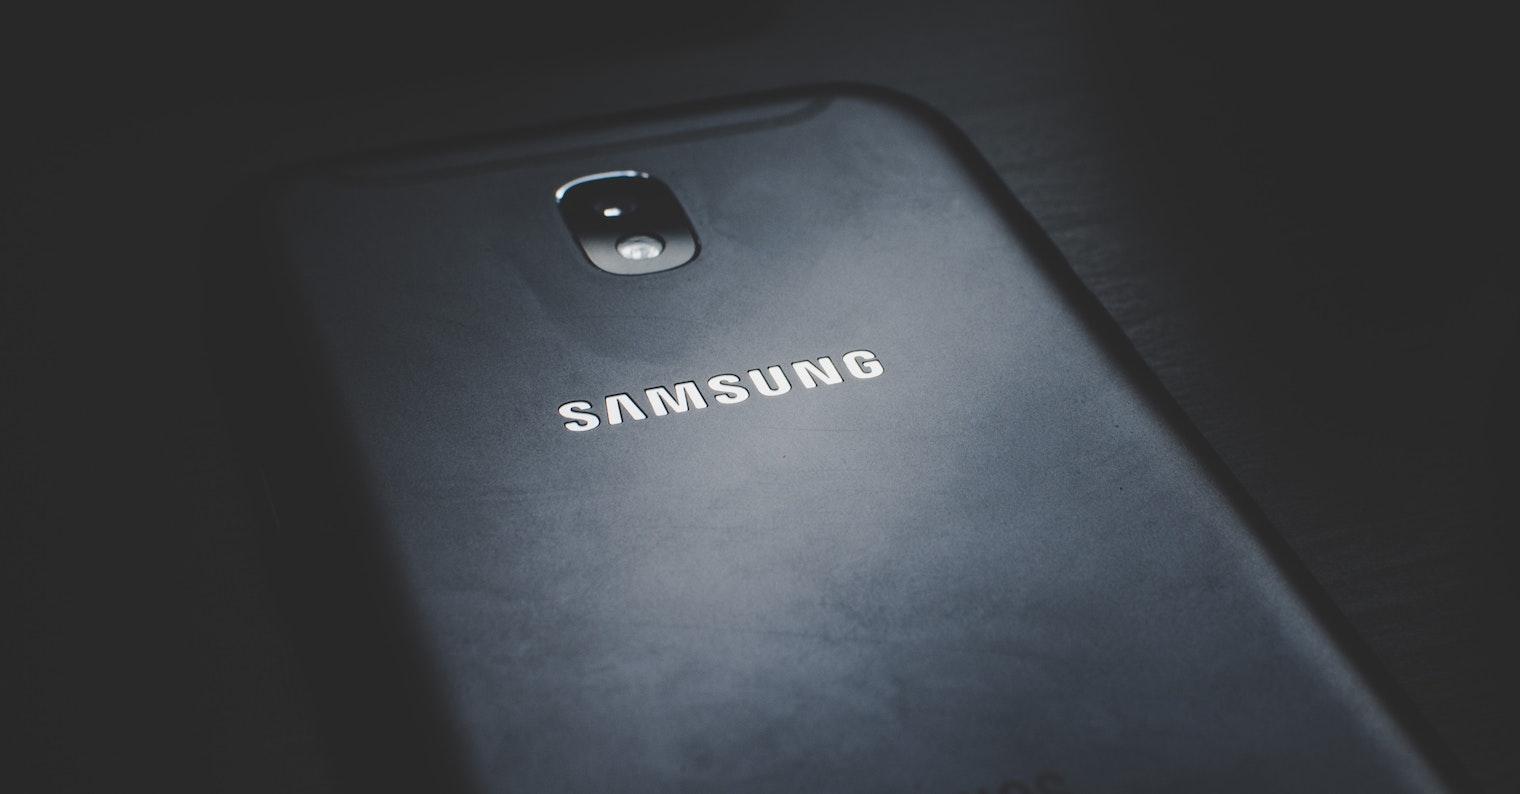 Samsung brand FB